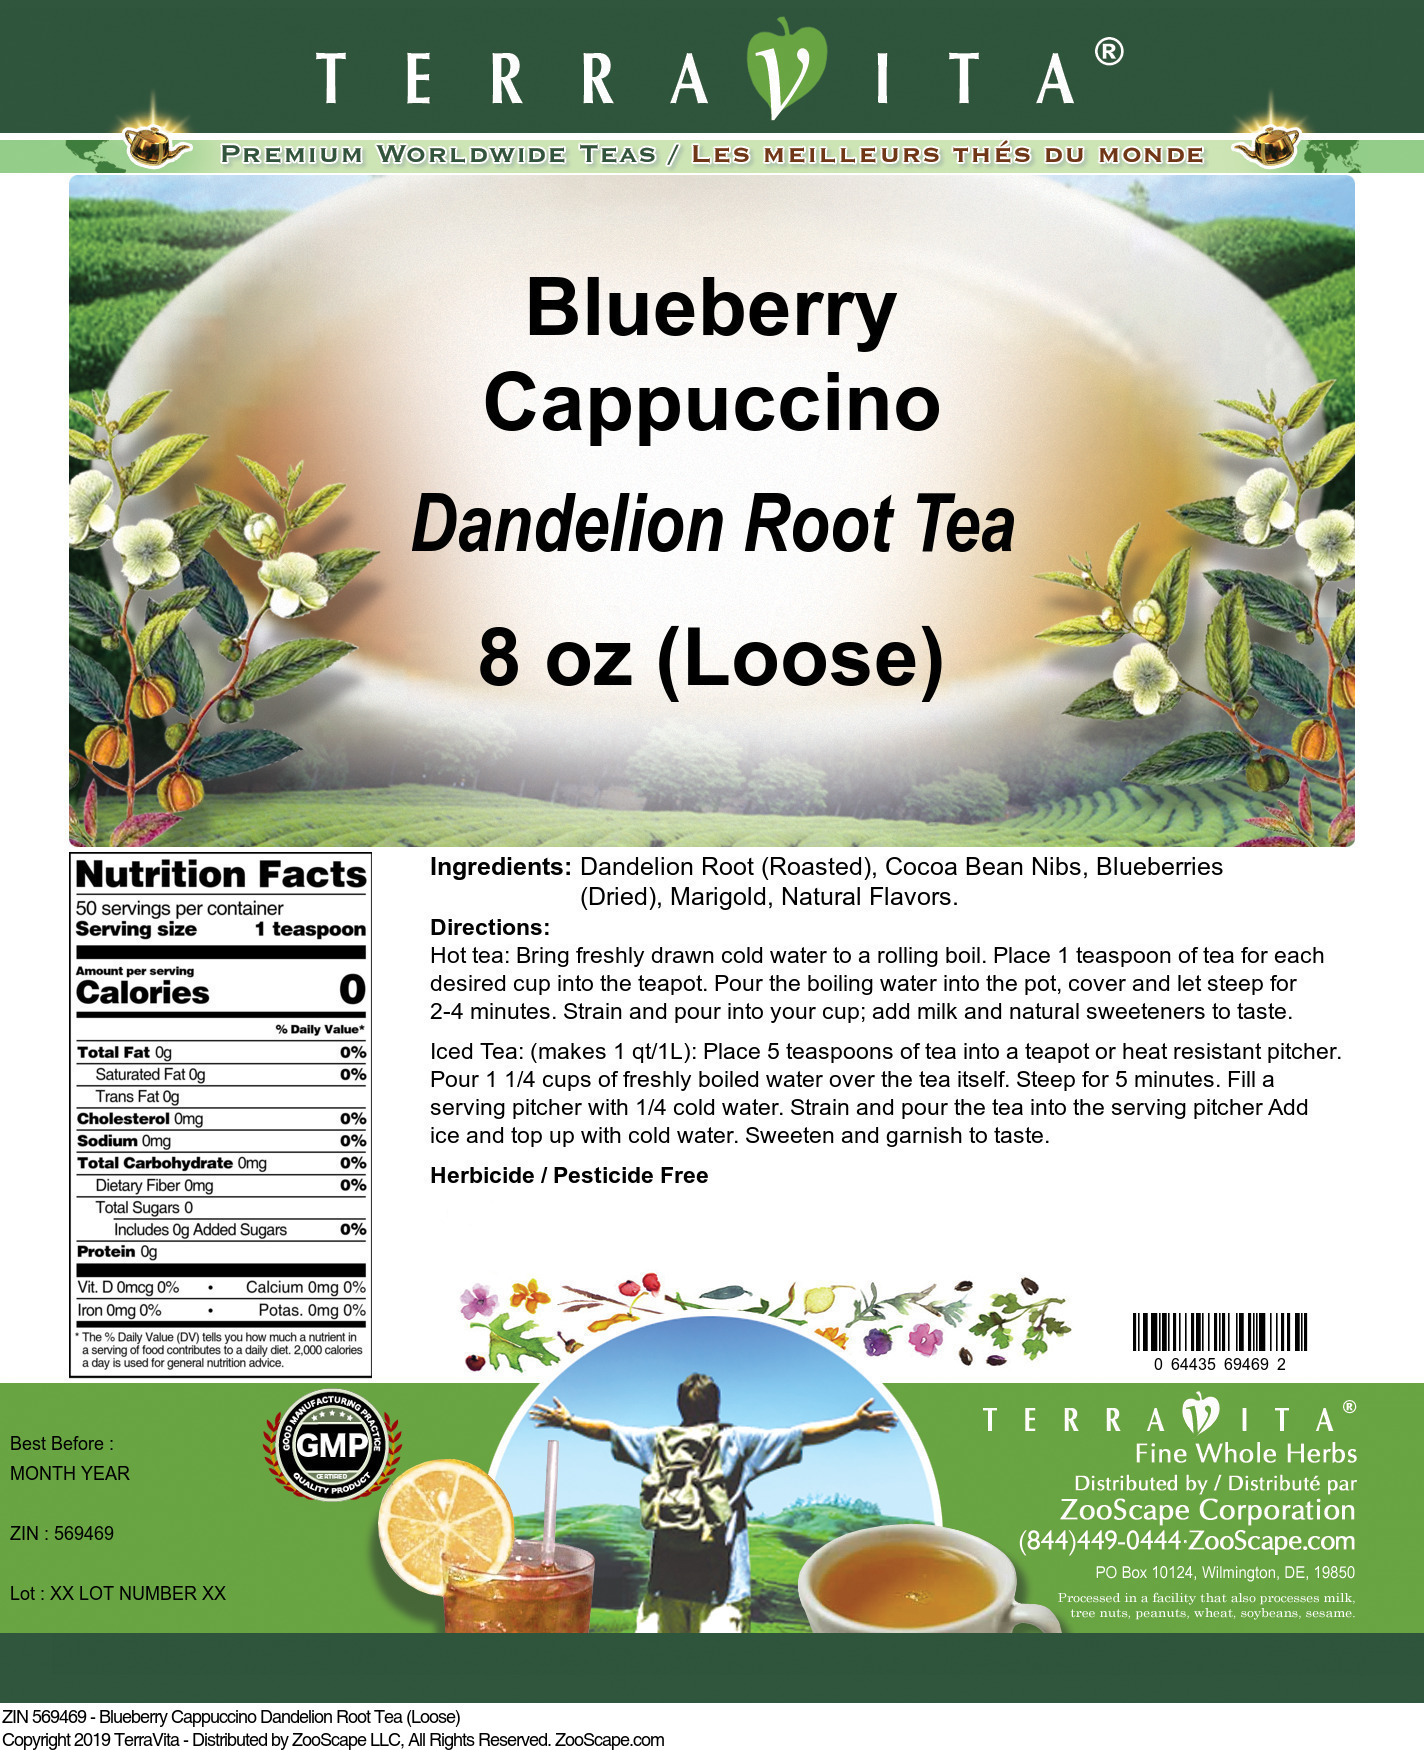 Blueberry Cappuccino Dandelion Root Tea (Loose)